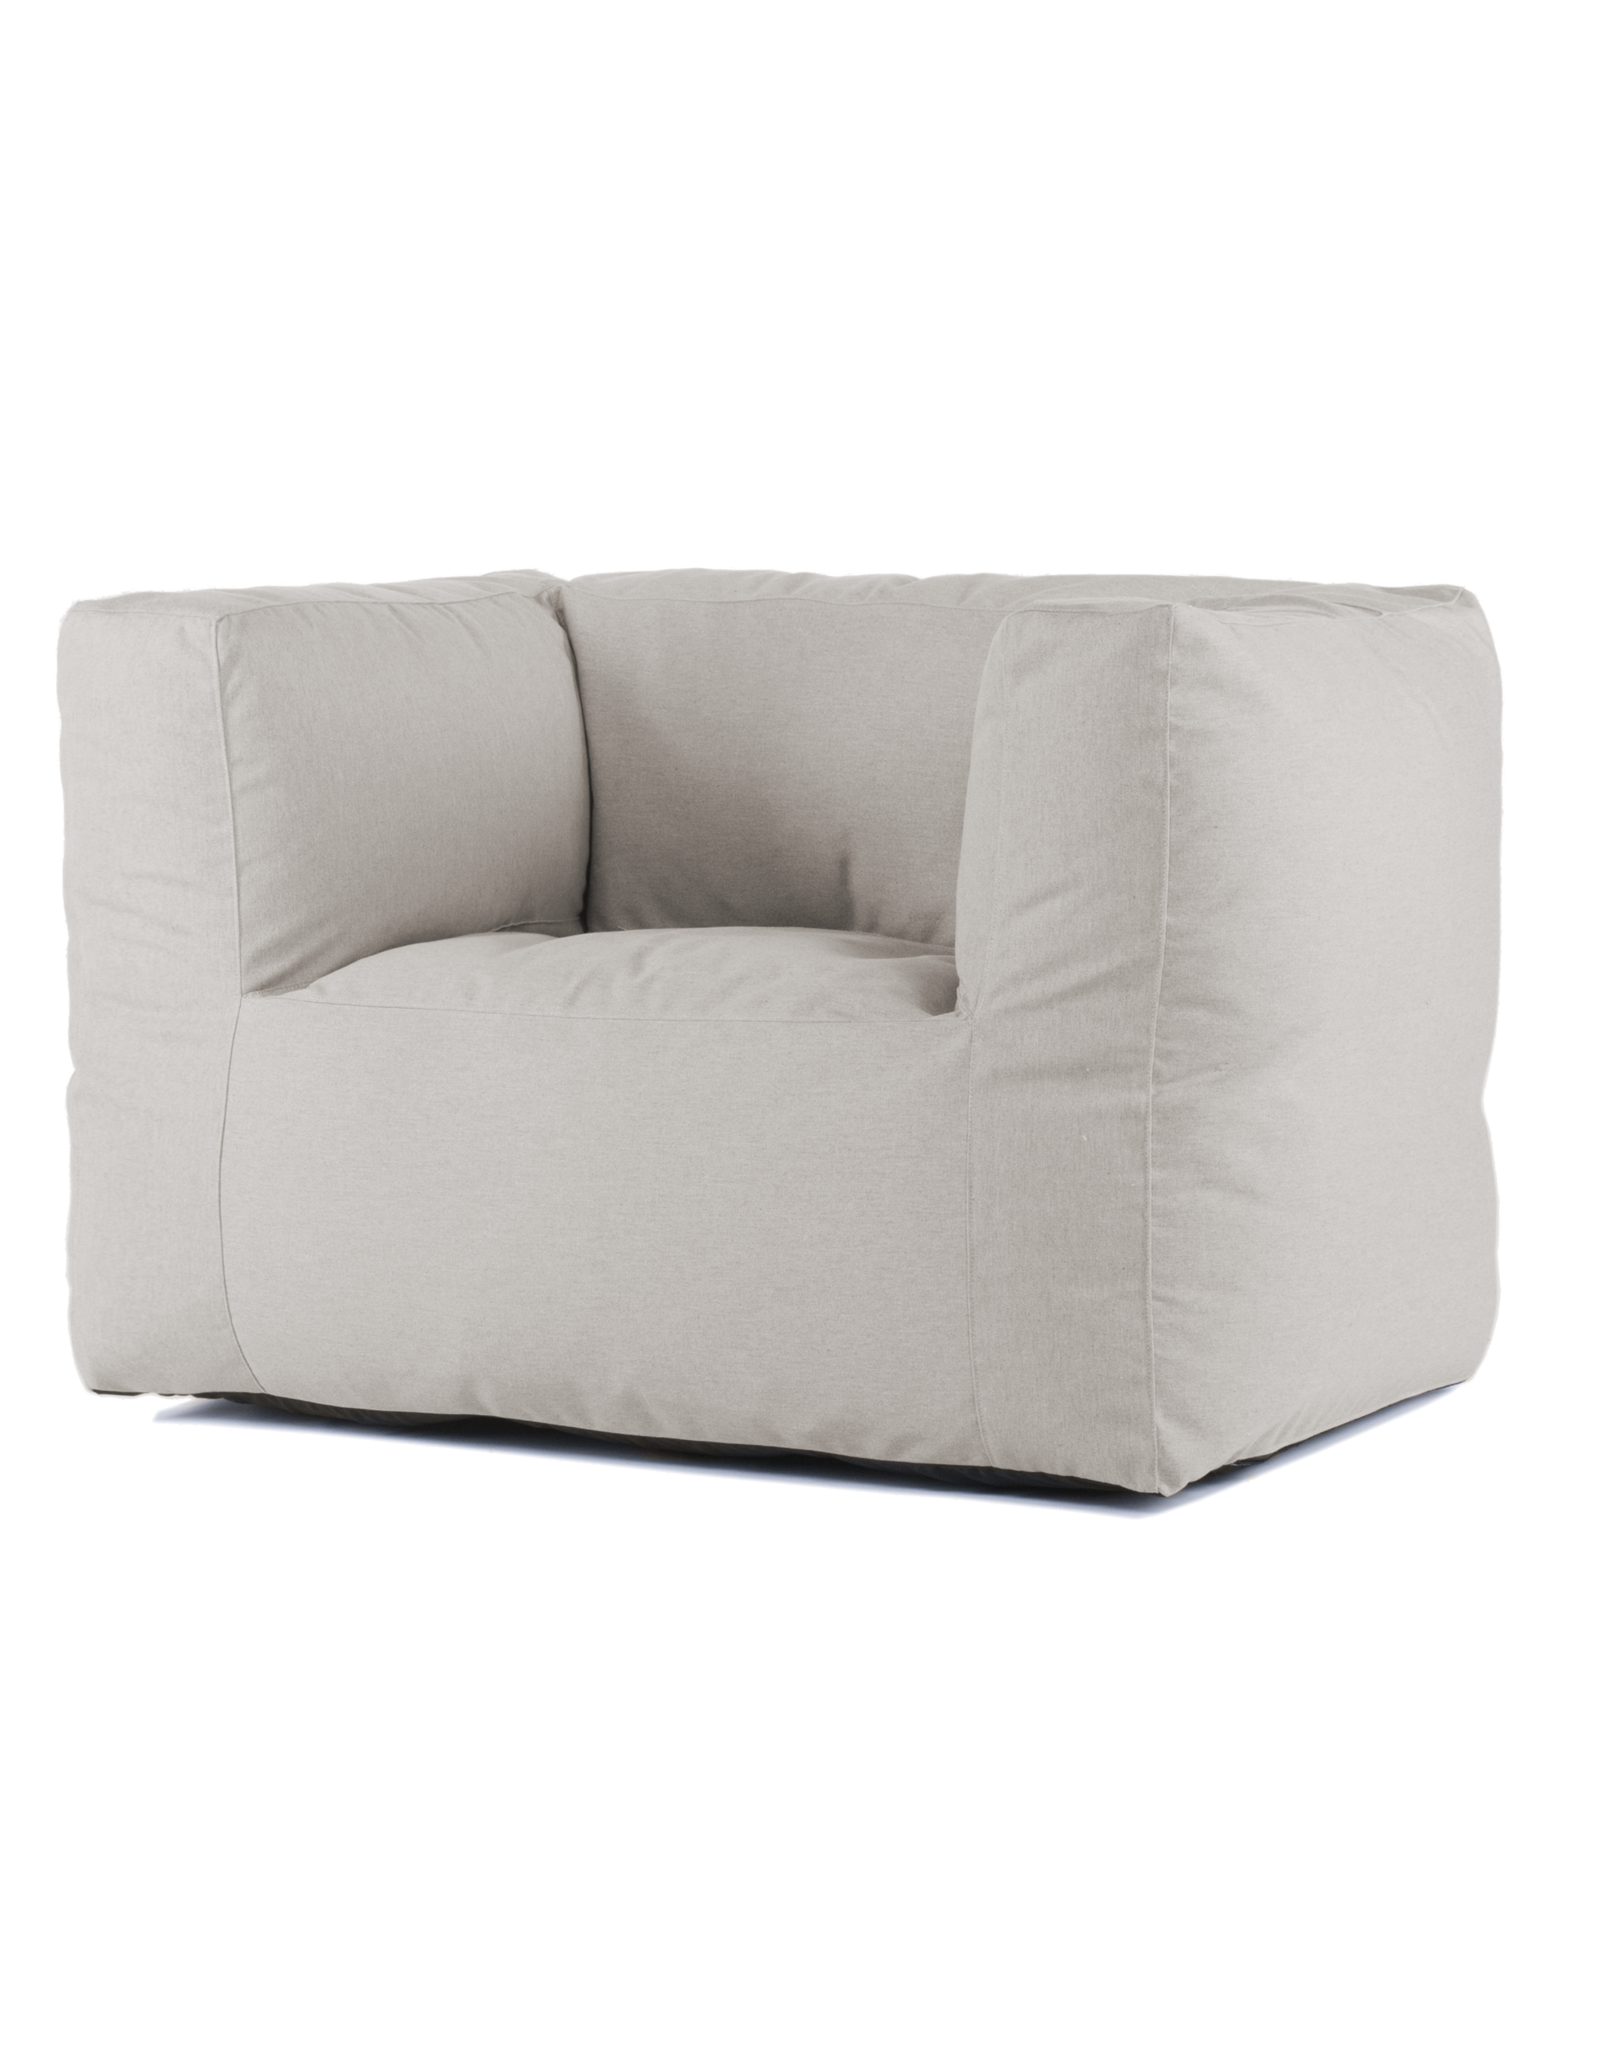 Bryck Bryck - chair - Ecollection - light grey